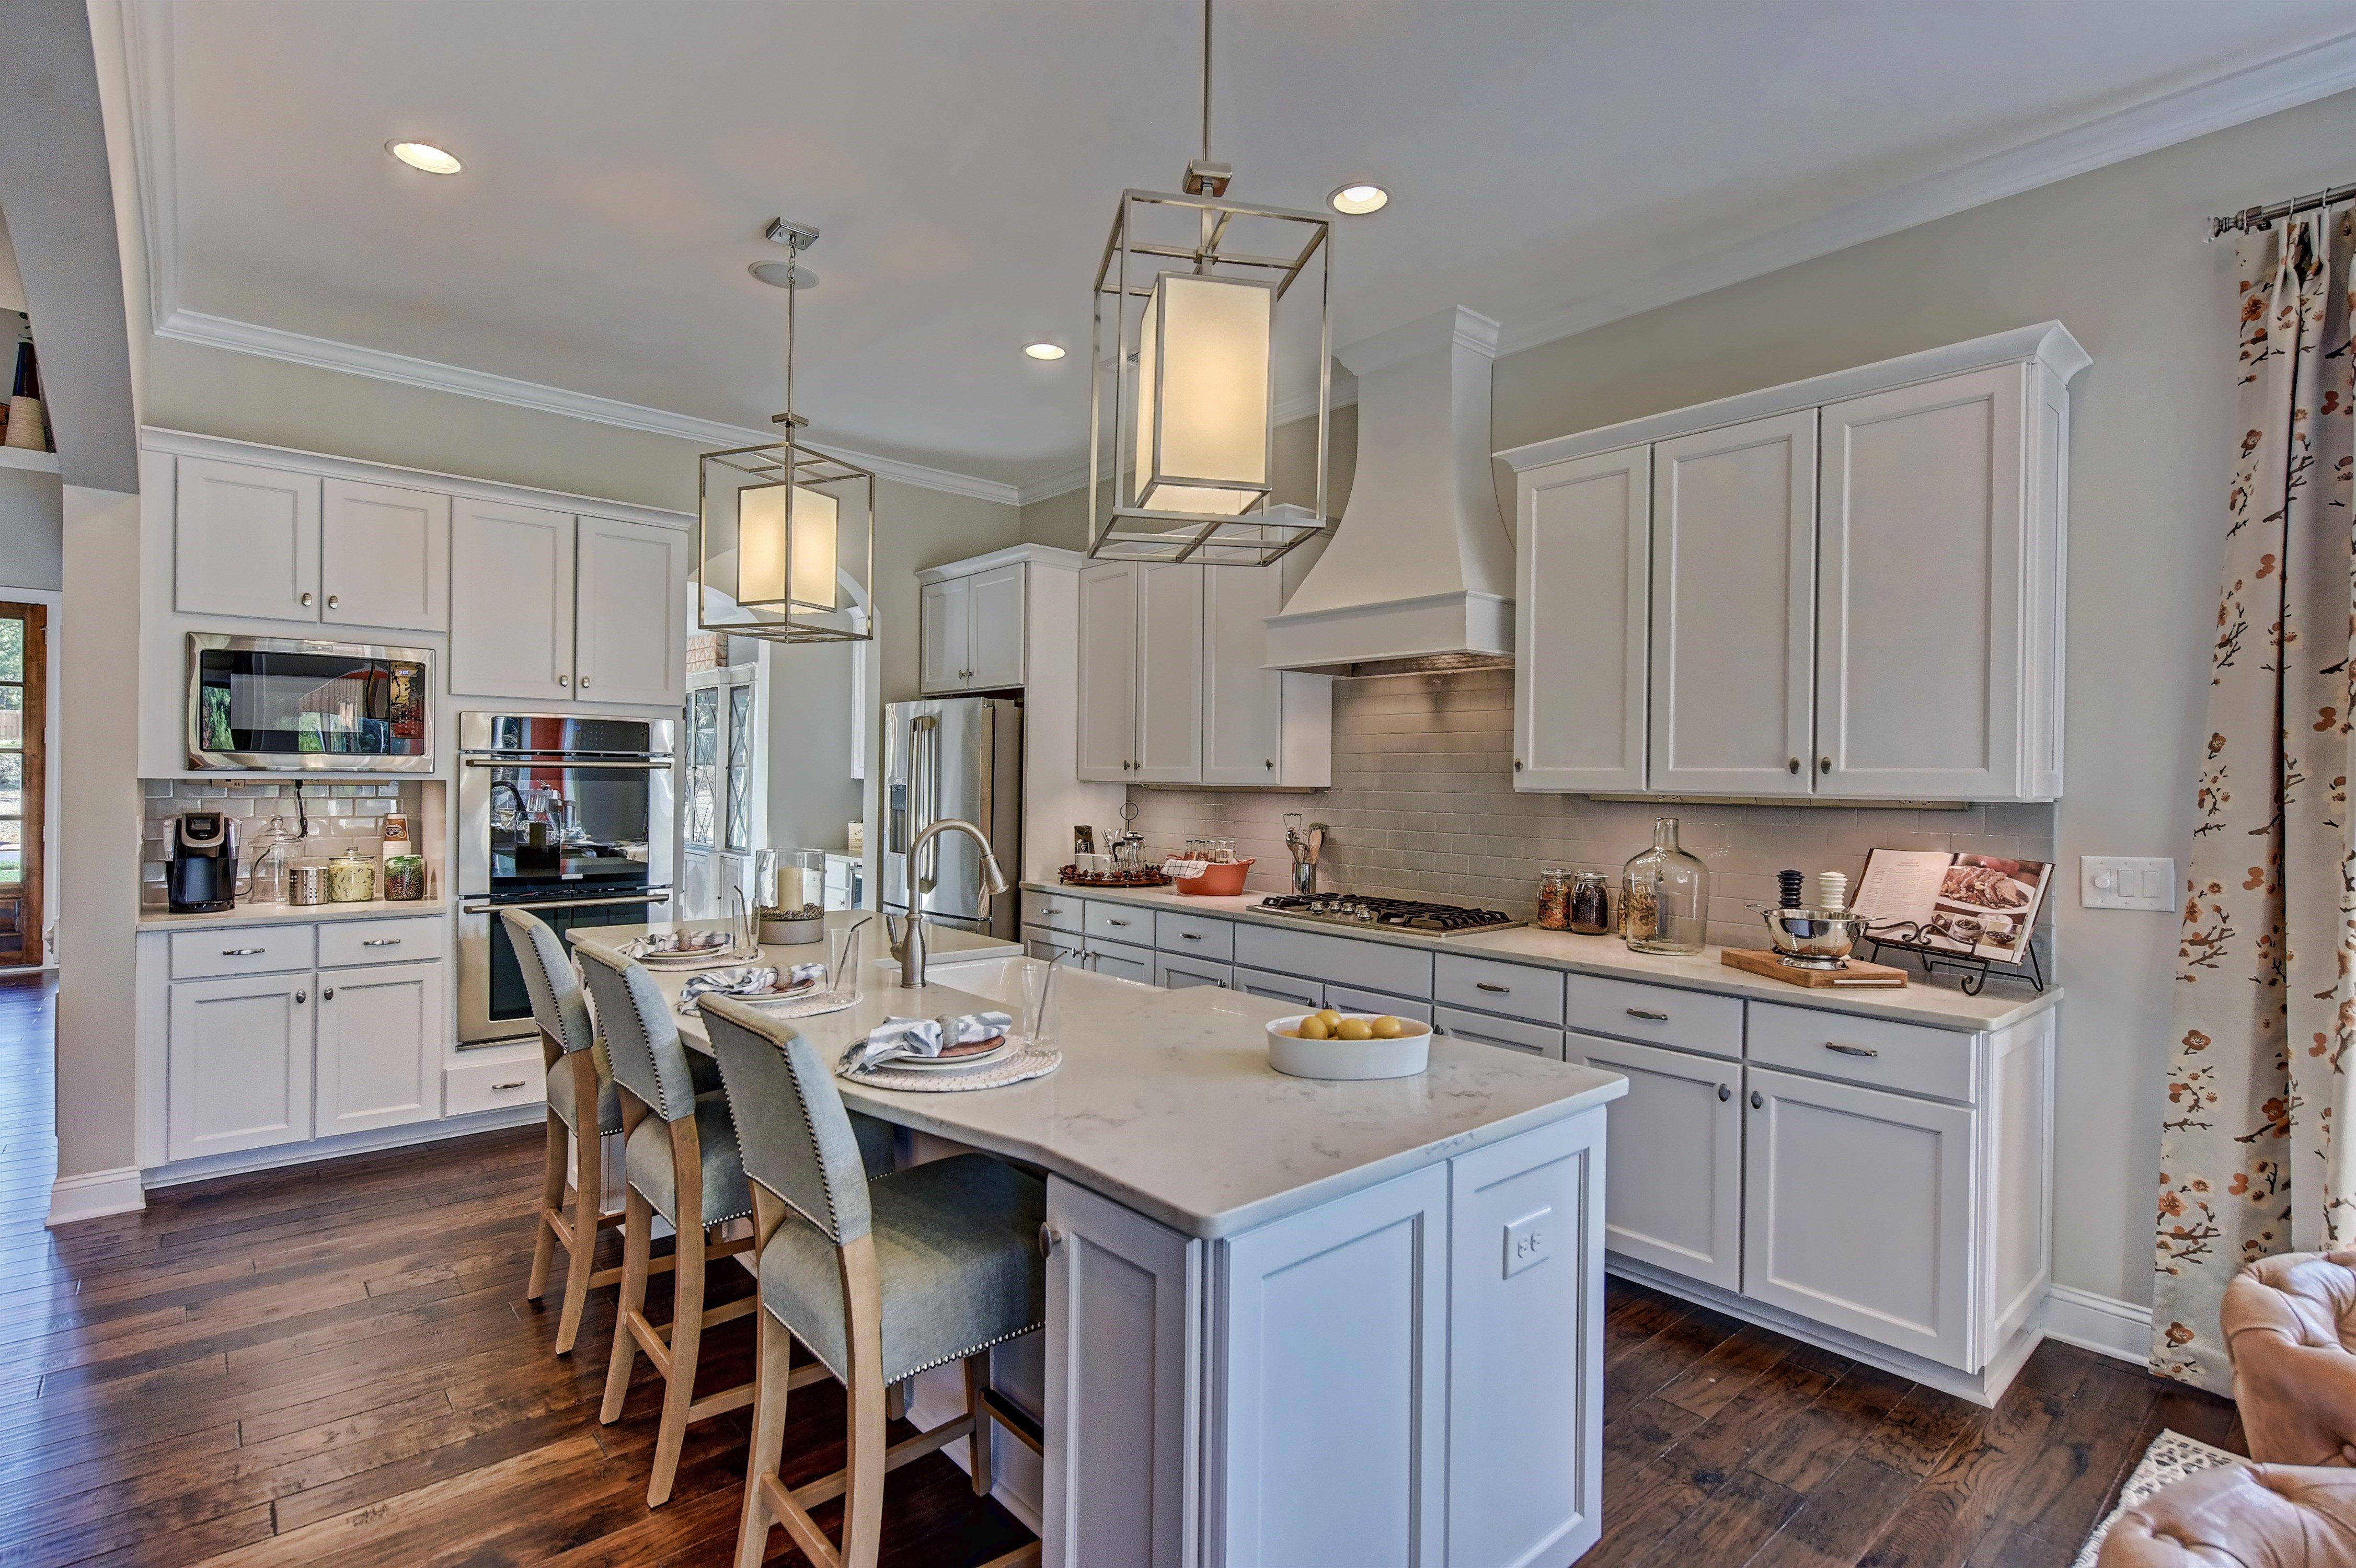 Alpine White Cabinets By Echelon Whitecabinets Kitchen White Cabinets Kitchen And Bath Kitchen